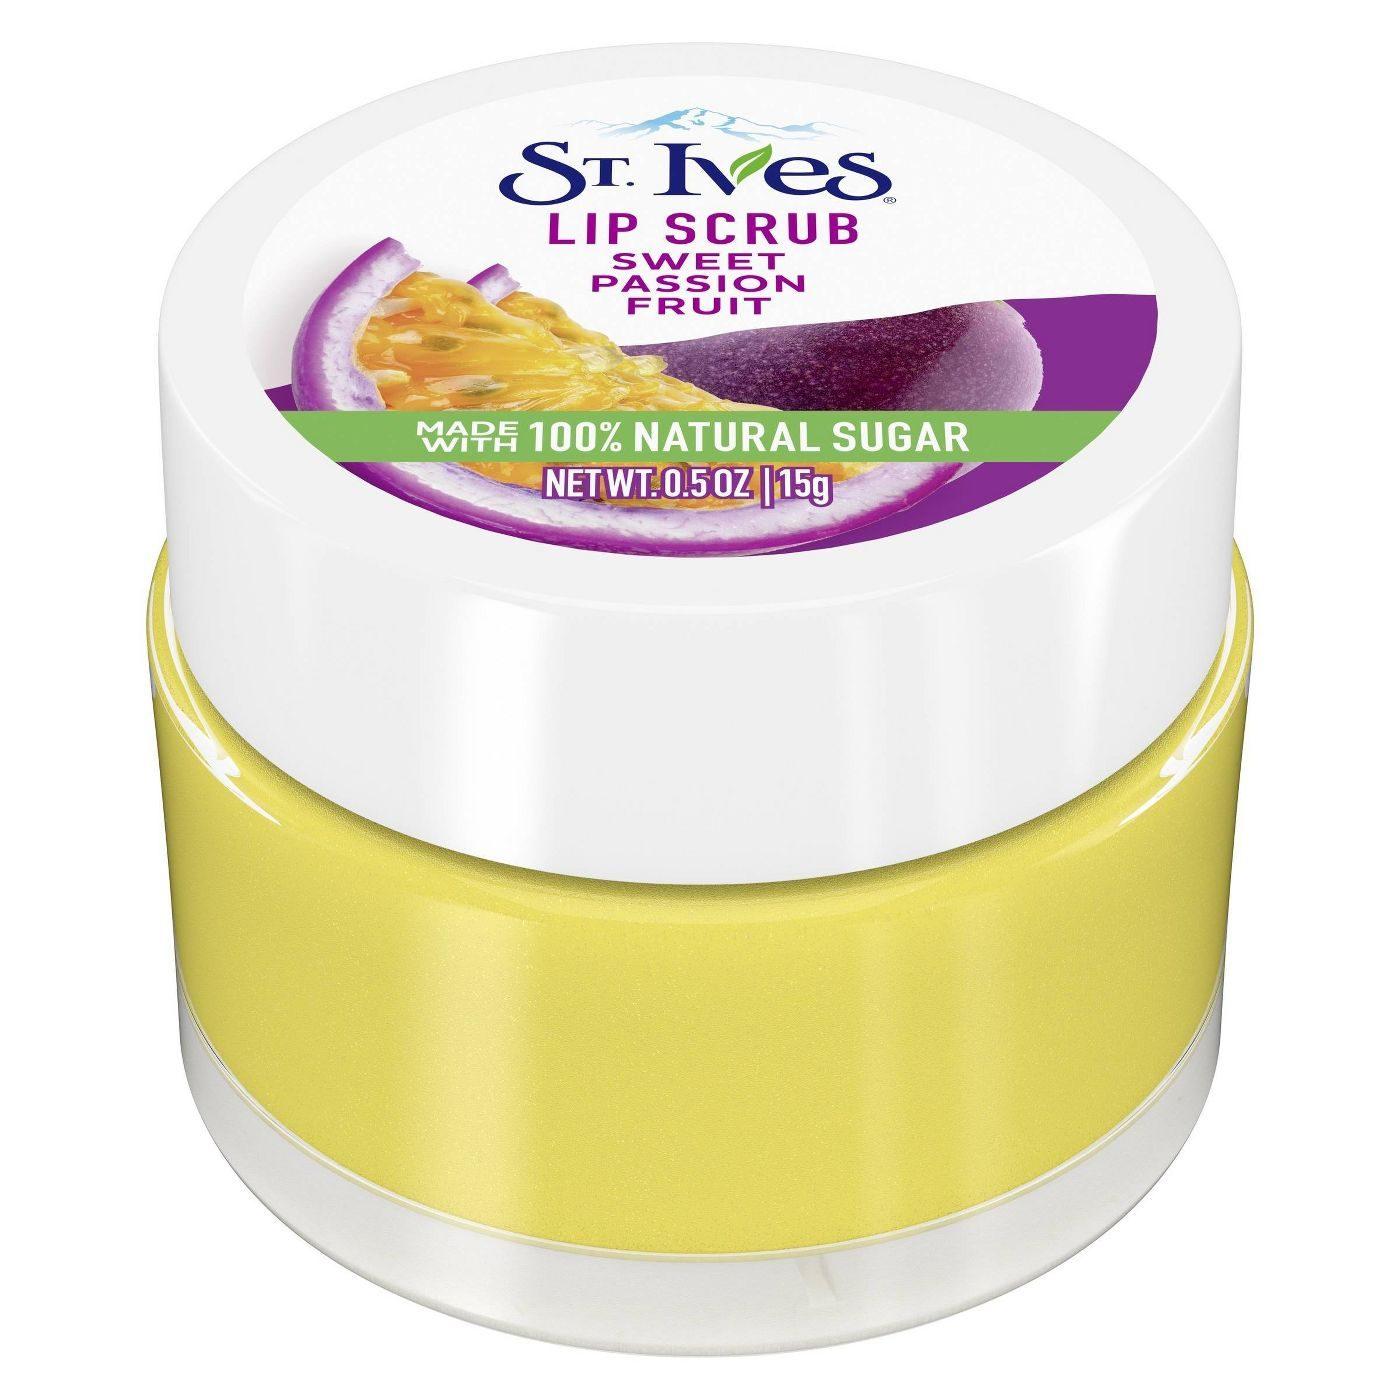 st. ives lip scrub